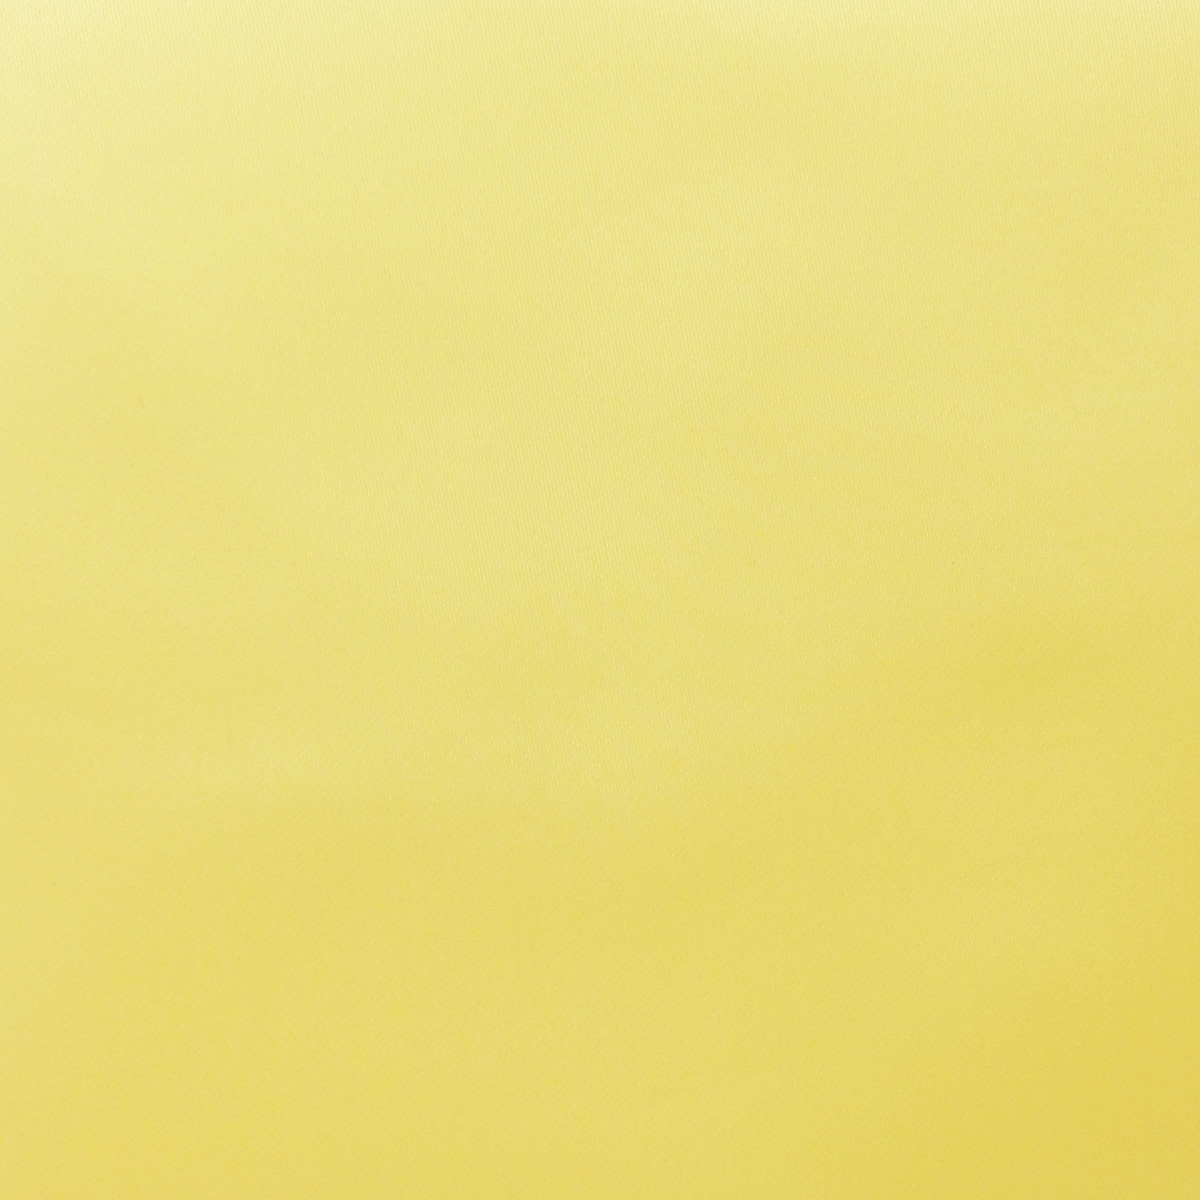 B1764 08 lemon mens ties facemasks con murphys menswear cork - - Con Murphys Menswear